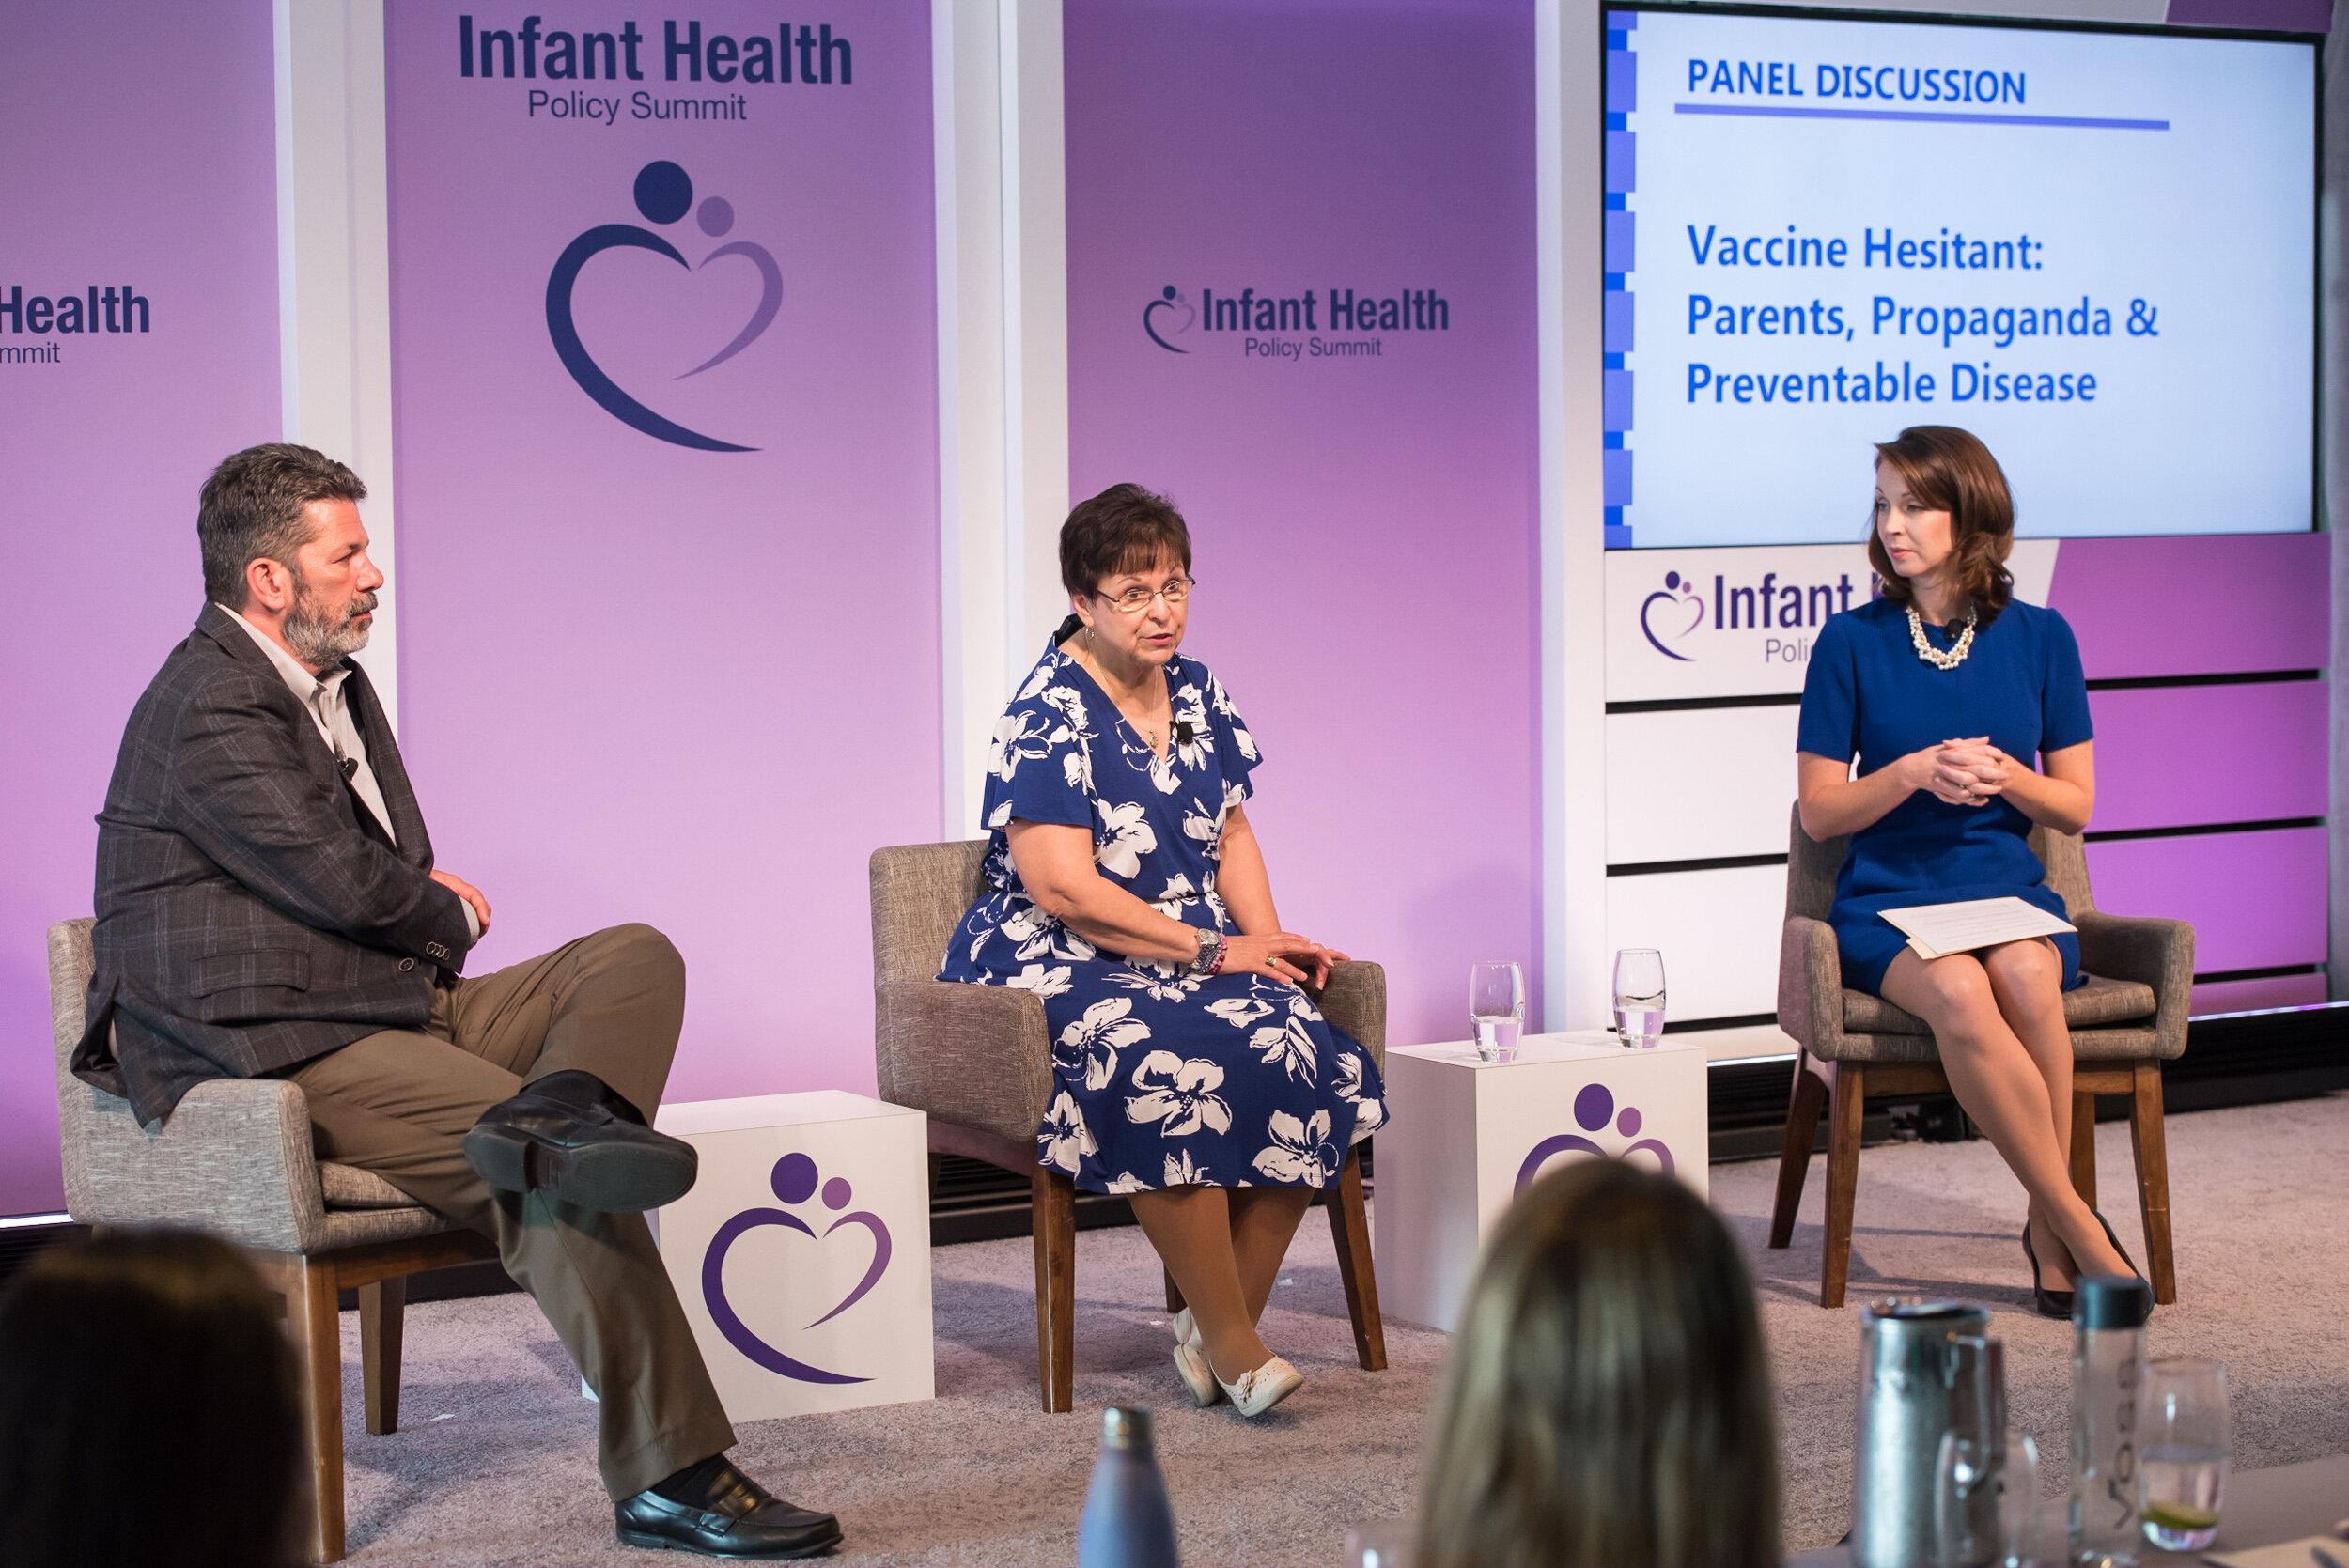 AfPA Infant Health Summit - Jason Dixson Photography - 190912 - 101042 - 0647.jpg